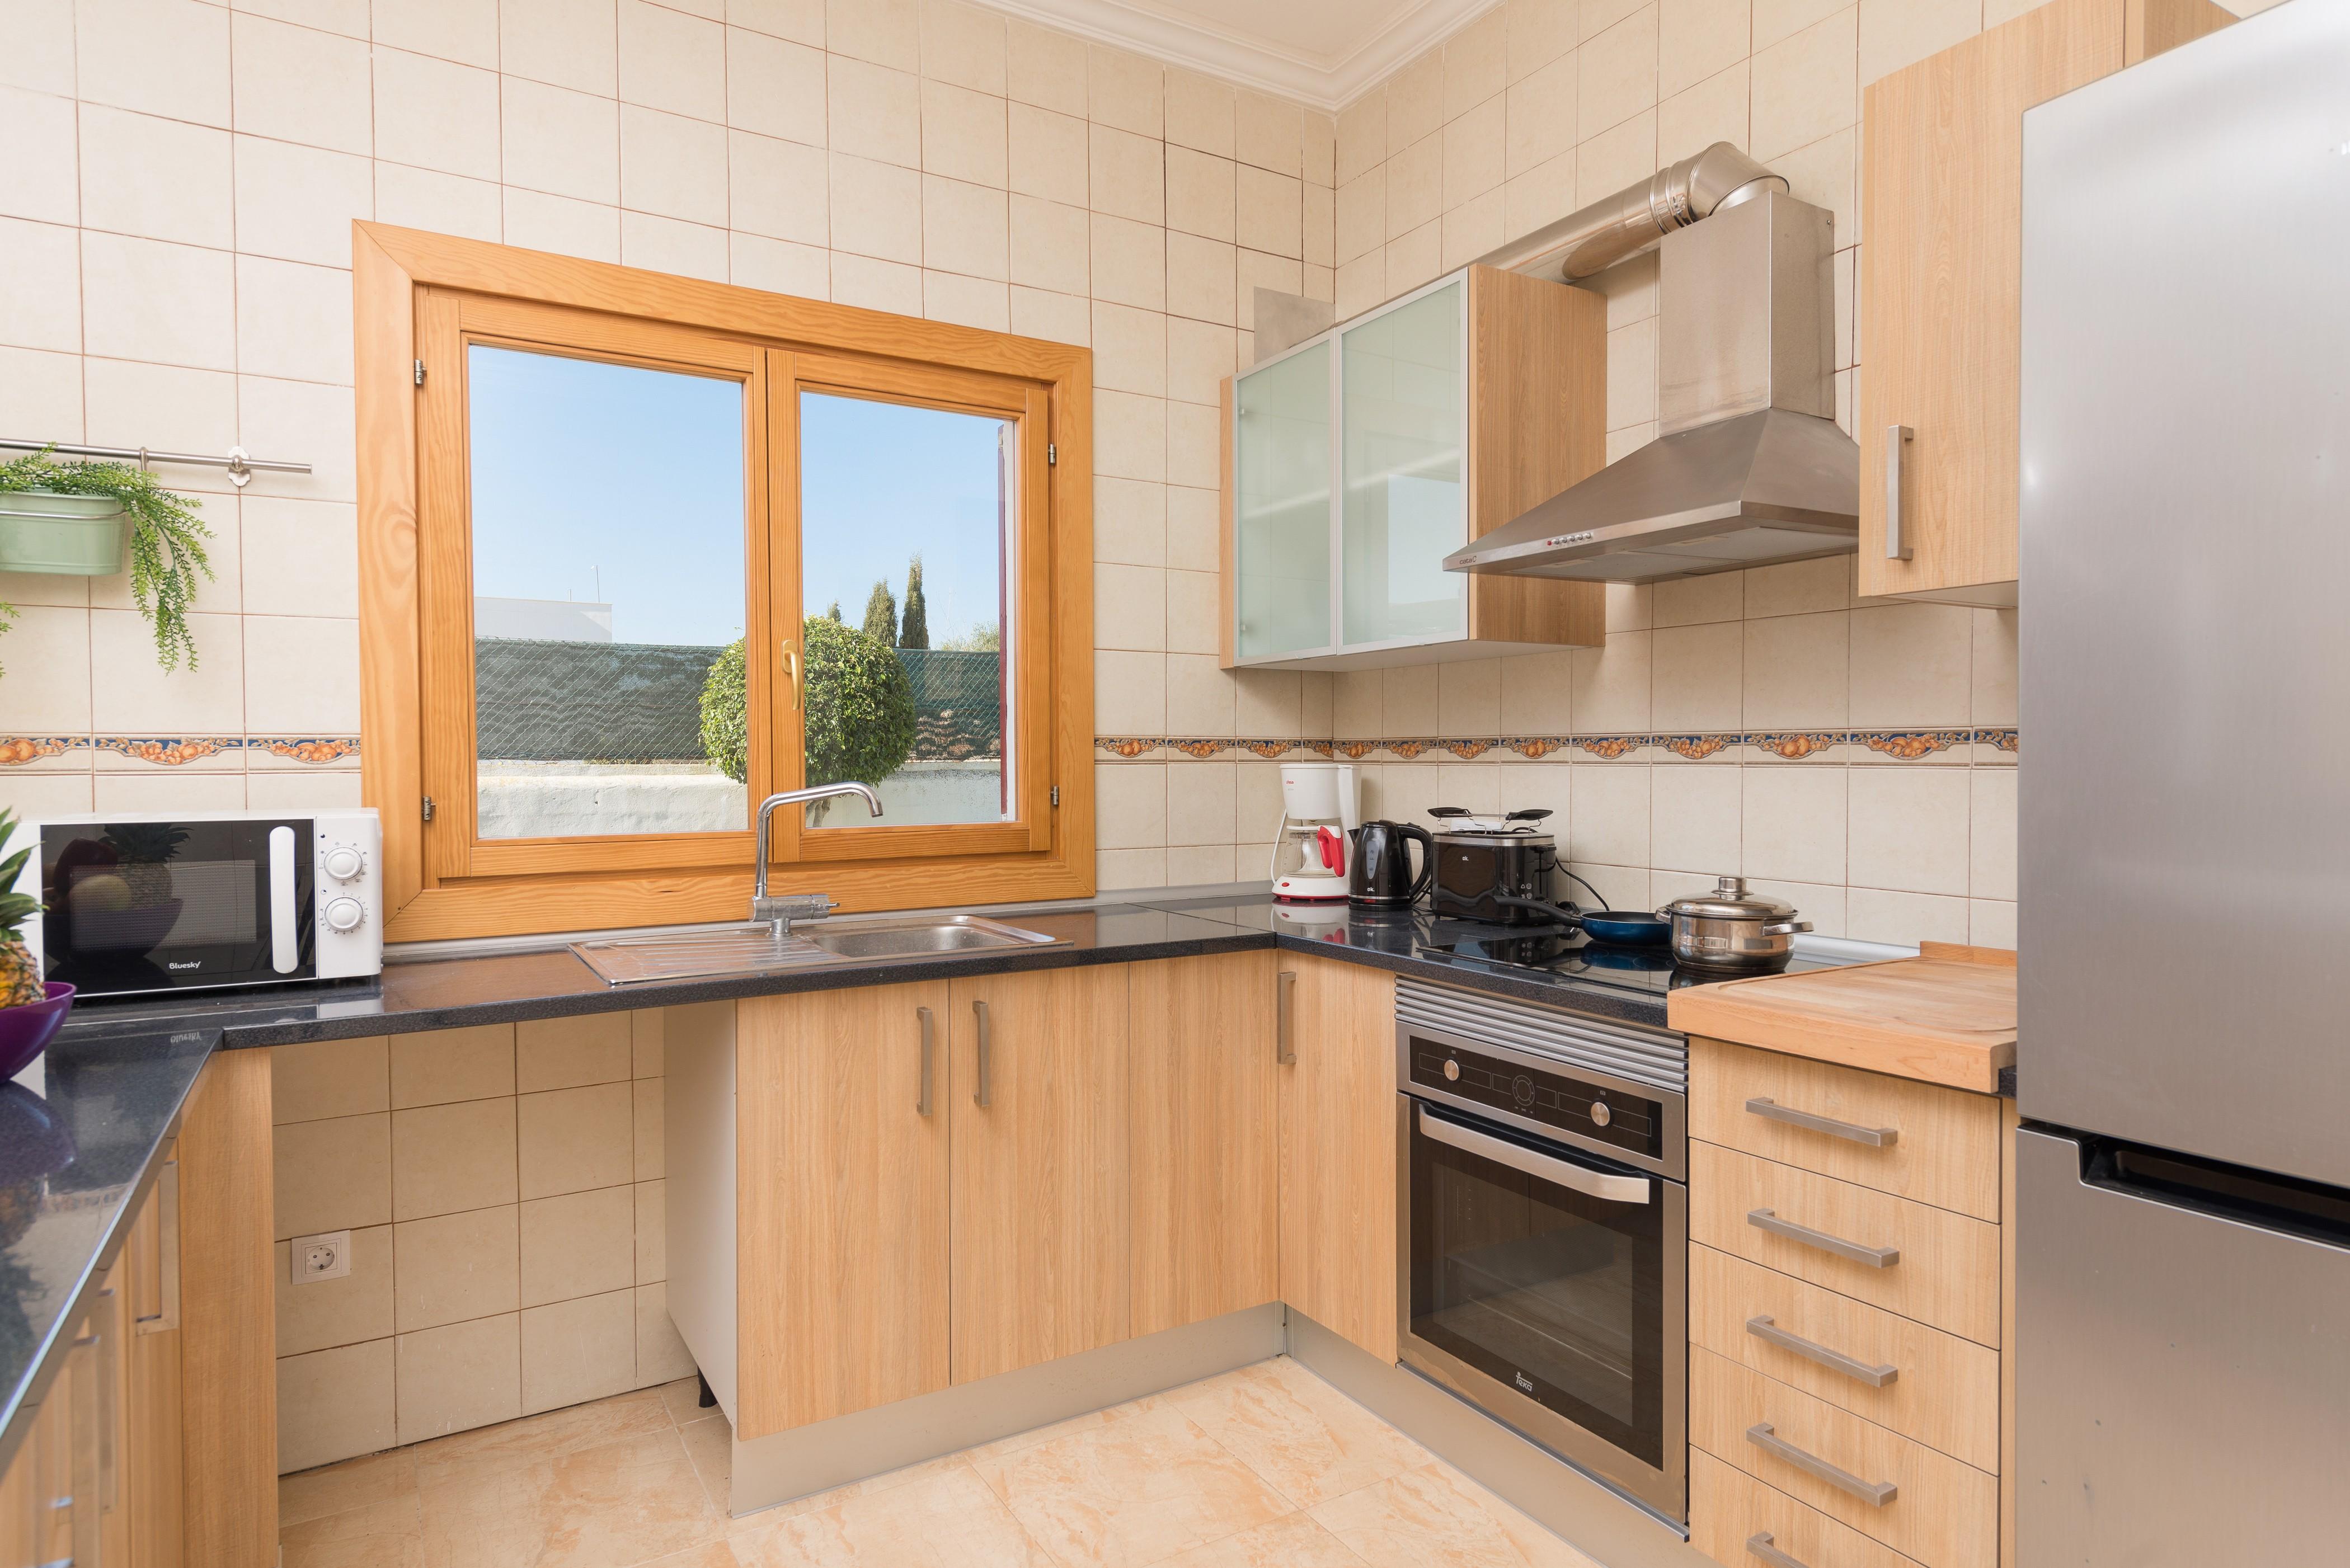 Ferienhaus CAN MOLINA (2063640), Cala Mandia, Mallorca, Balearische Inseln, Spanien, Bild 19